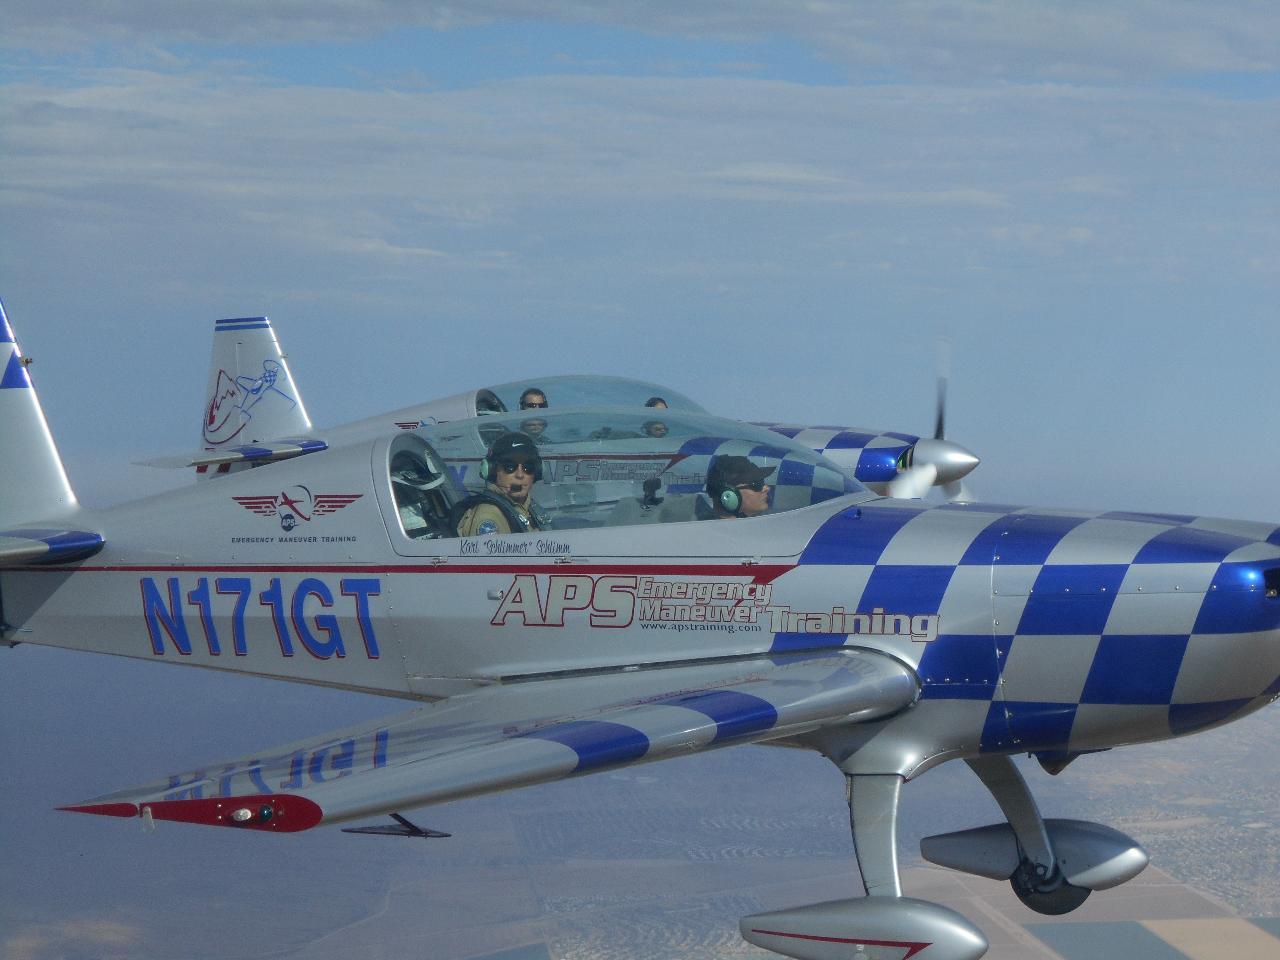 Air Combat - 1/2 Day Advanced Air Combat Mission - AZ